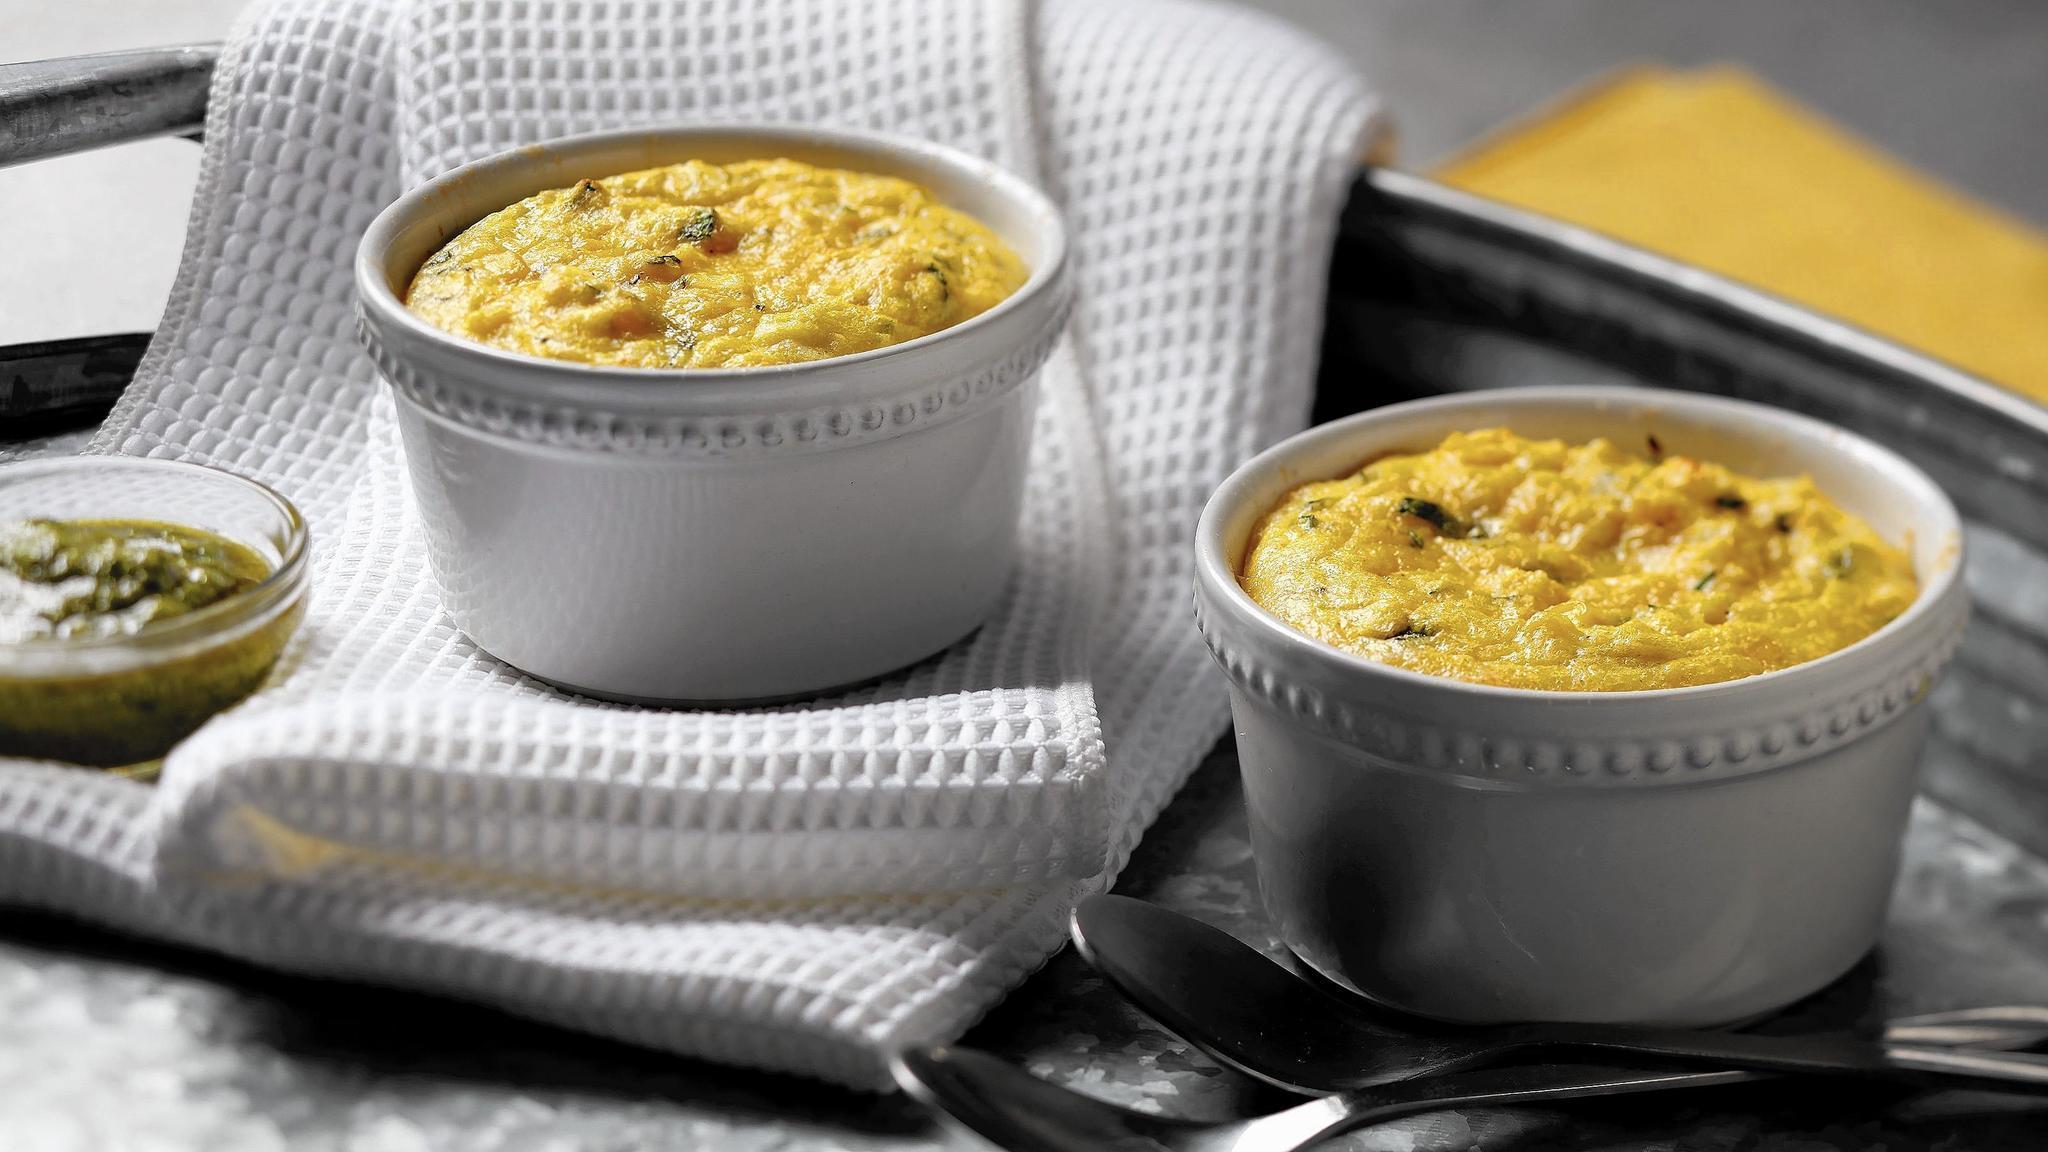 Corn pudding recipe transfers fresh, crisp kernels into rich, creamy goodness